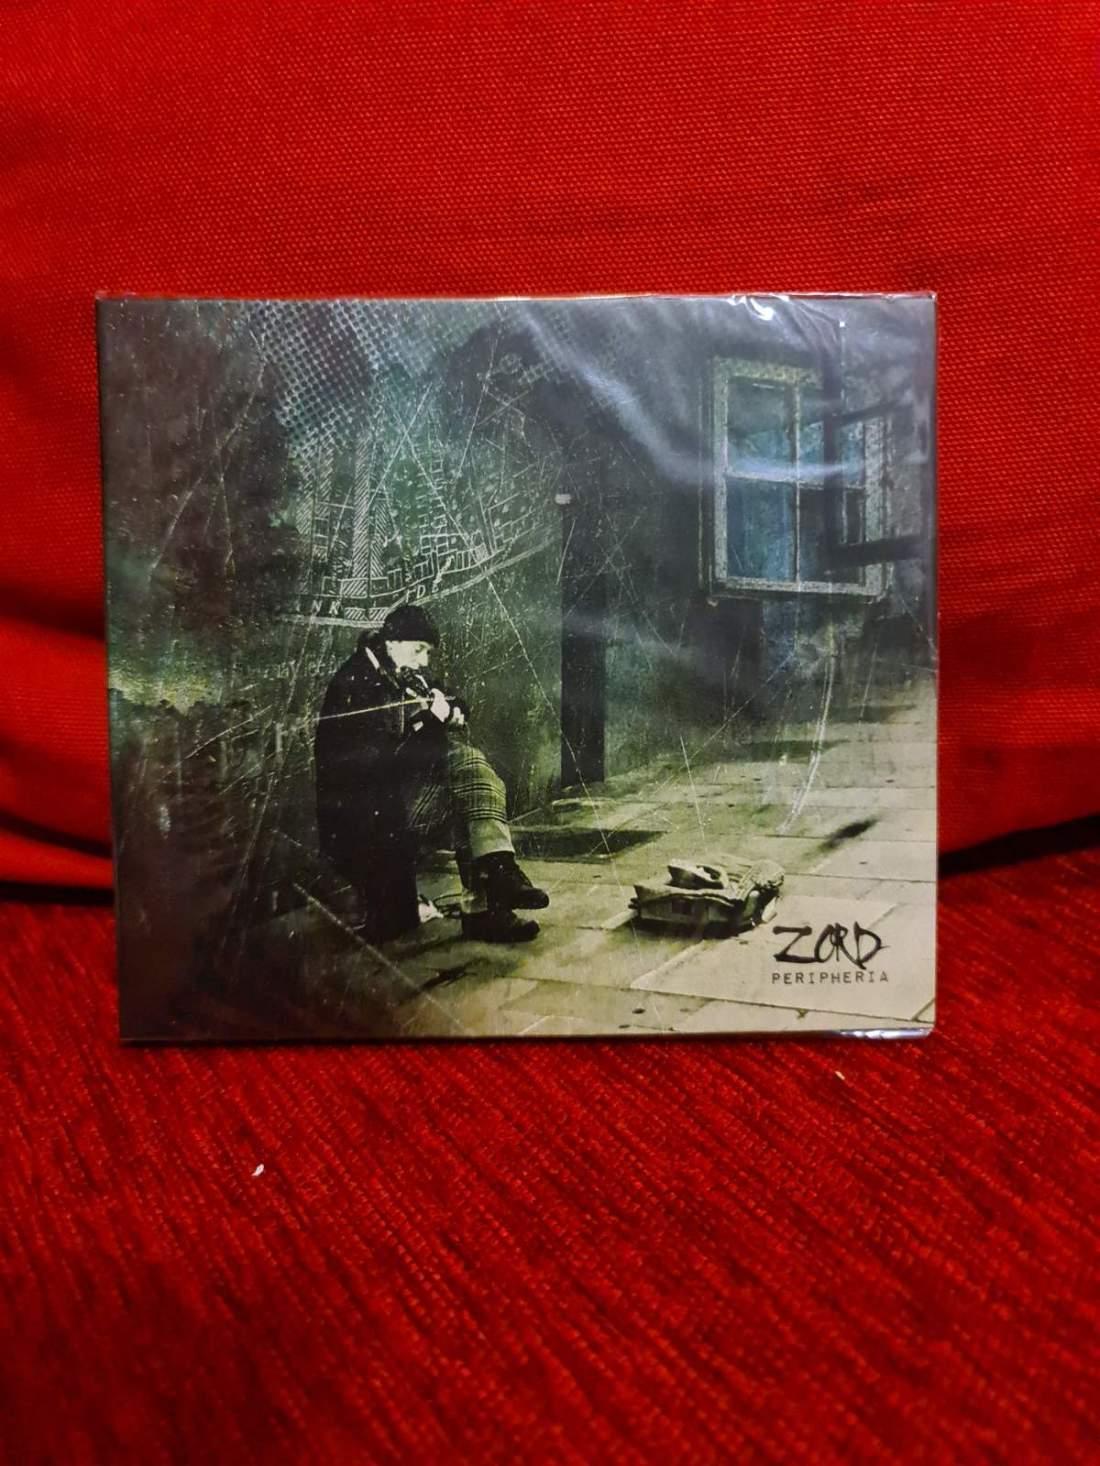 ZORD - PERIPHERIA CD